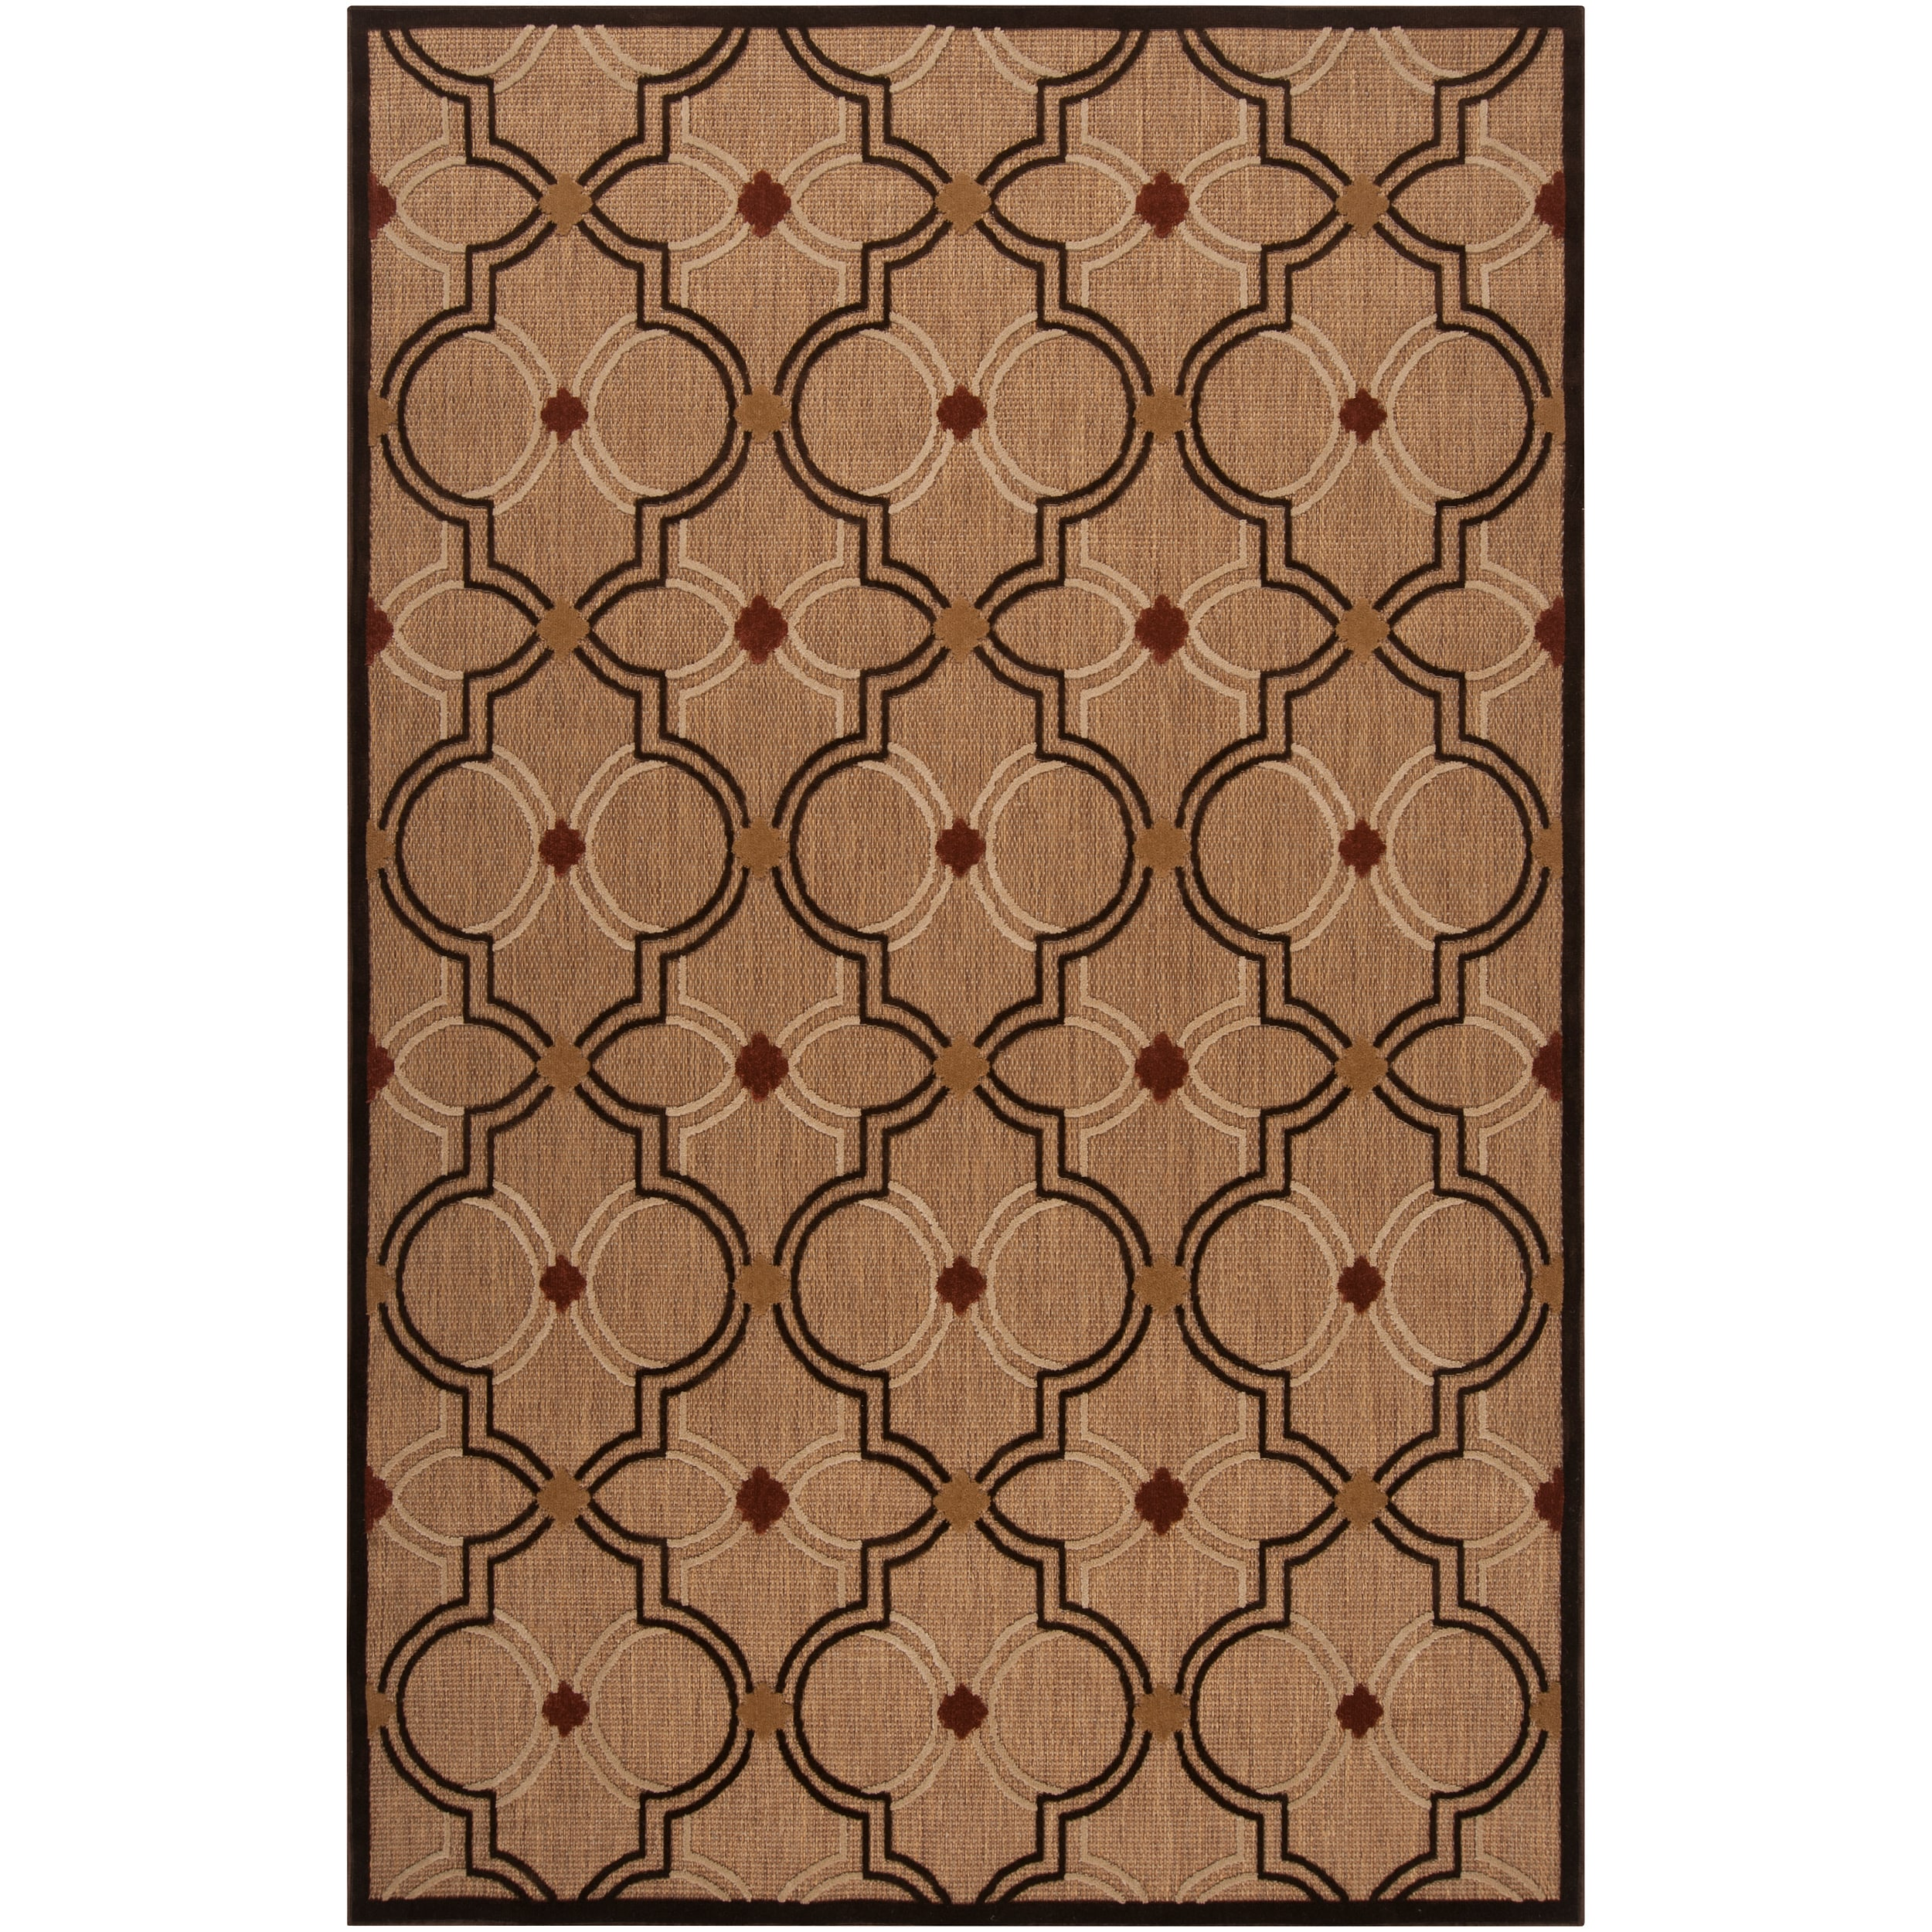 Woven Tan Tigua Indoor/Outdoor Moroccan Lattice Rug (8'8 x 12')